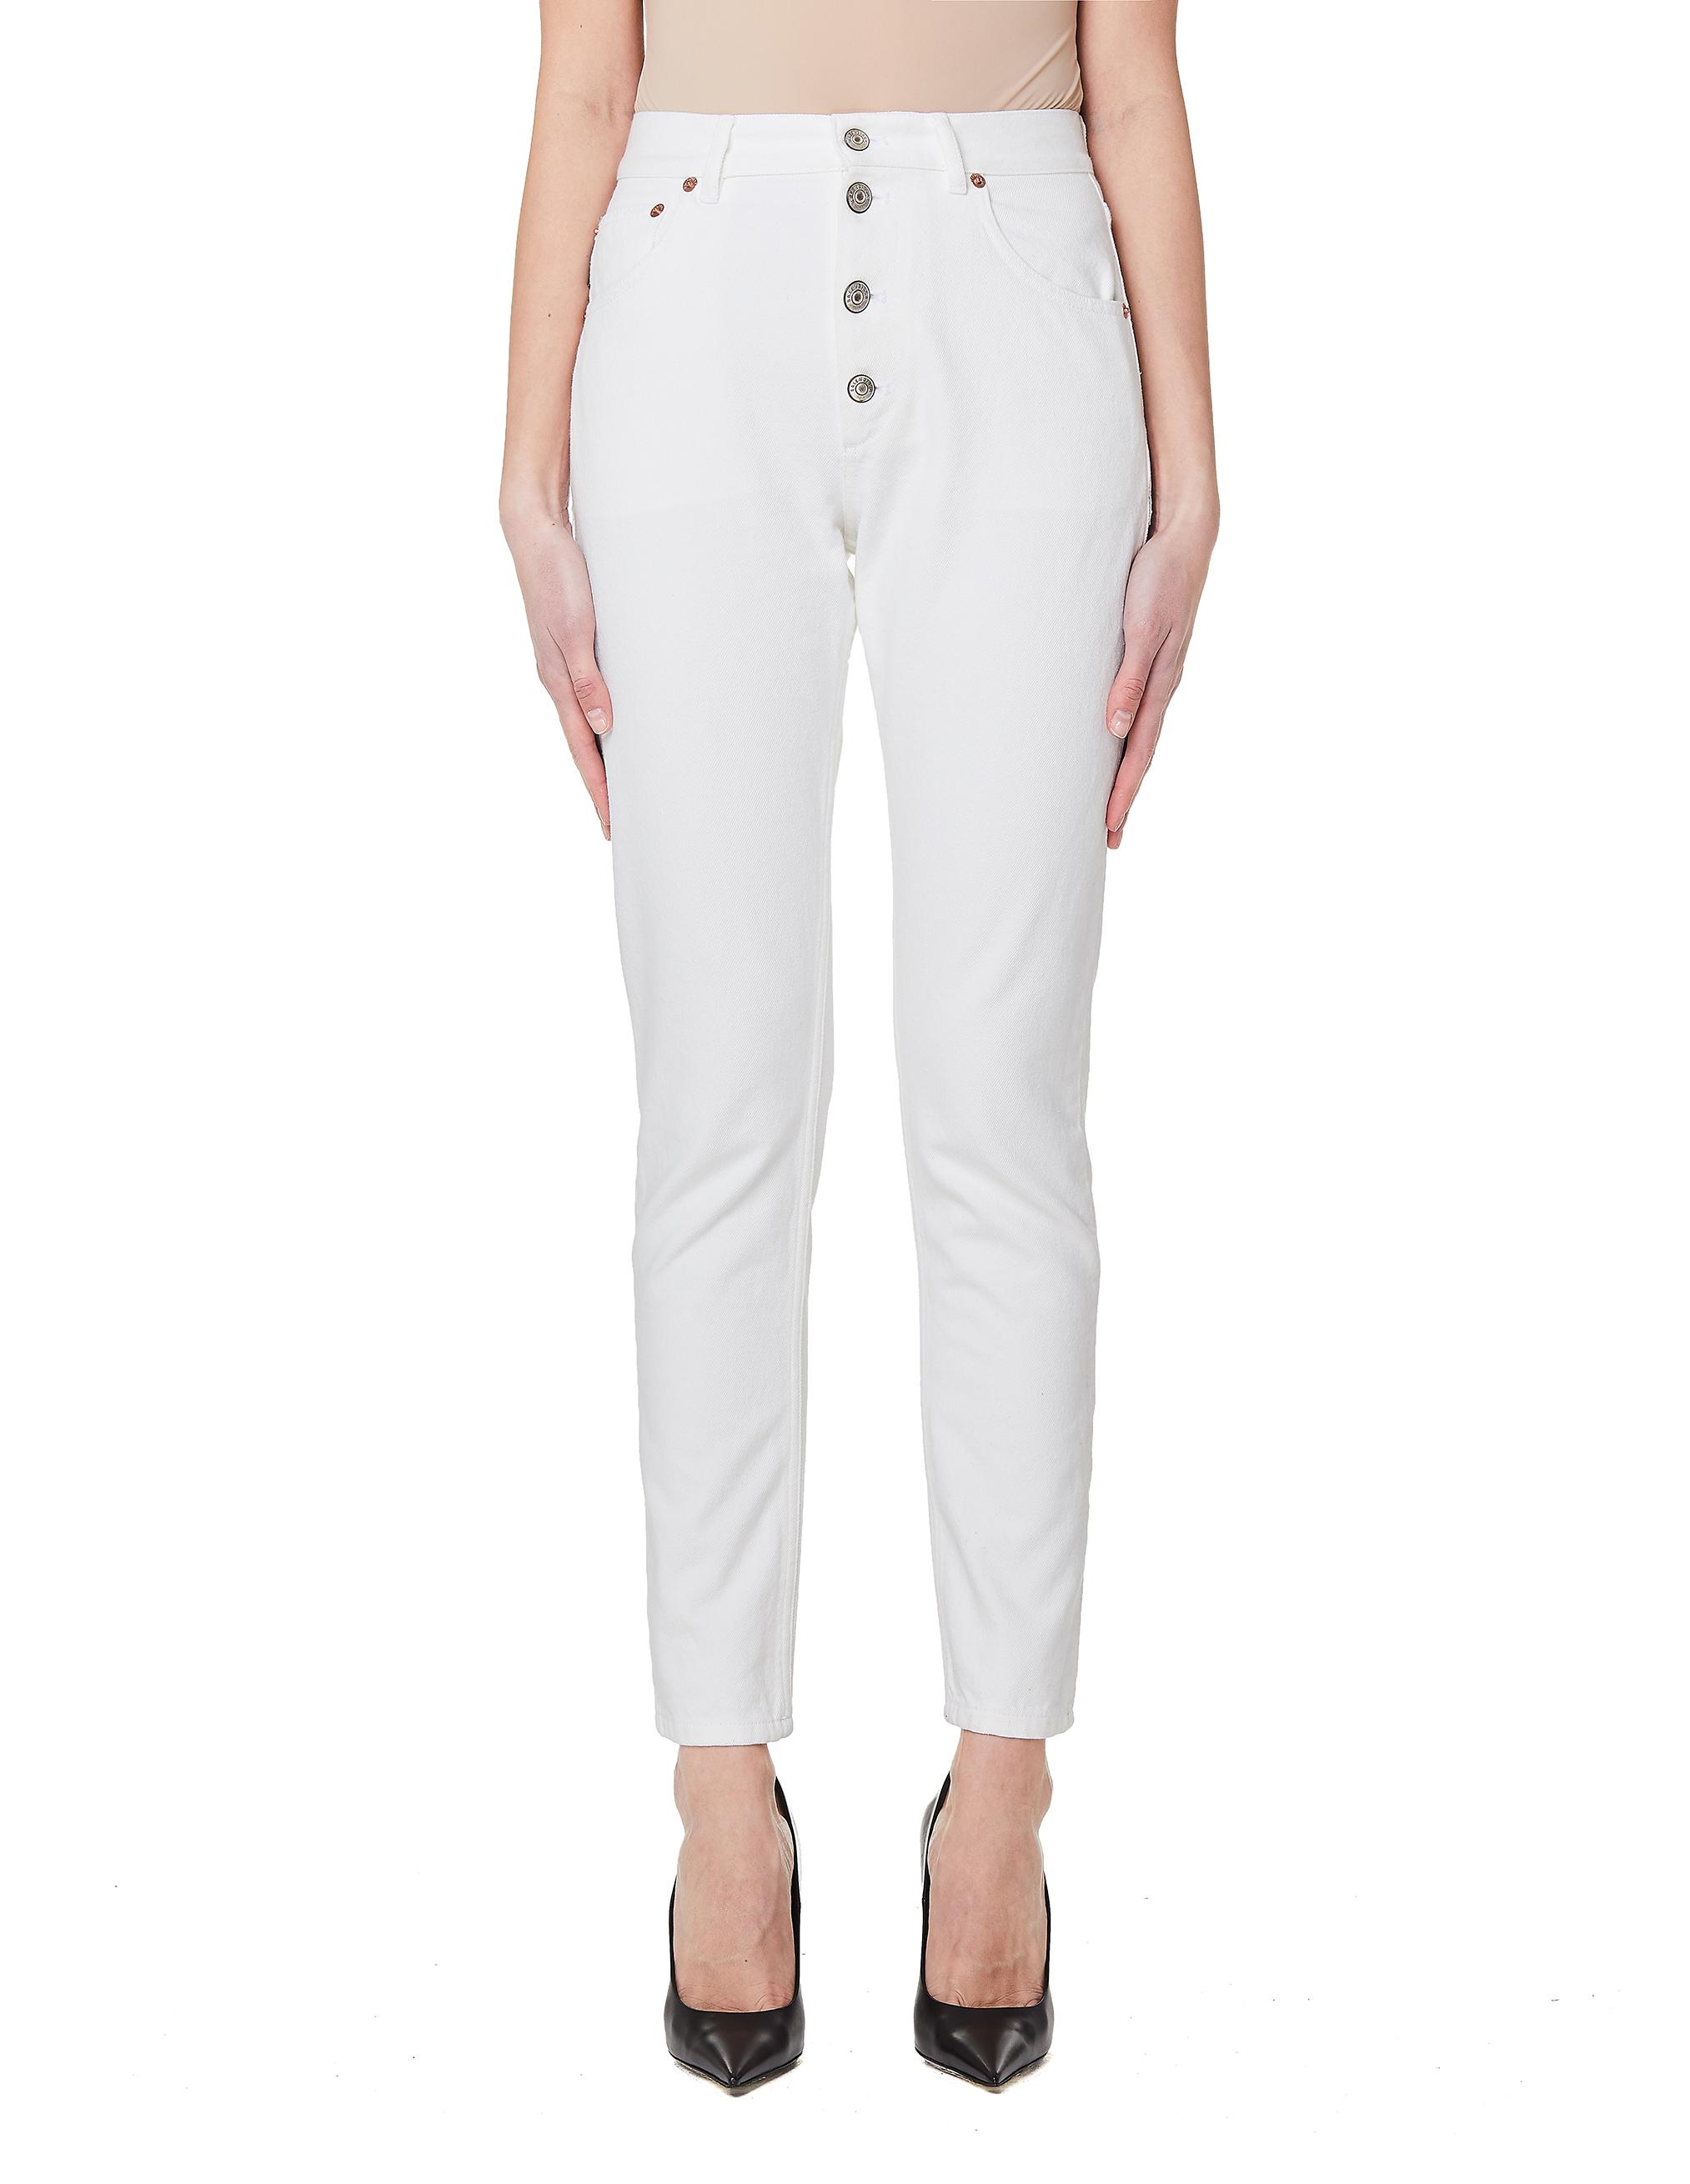 Balenciaga White Cotton Jeans